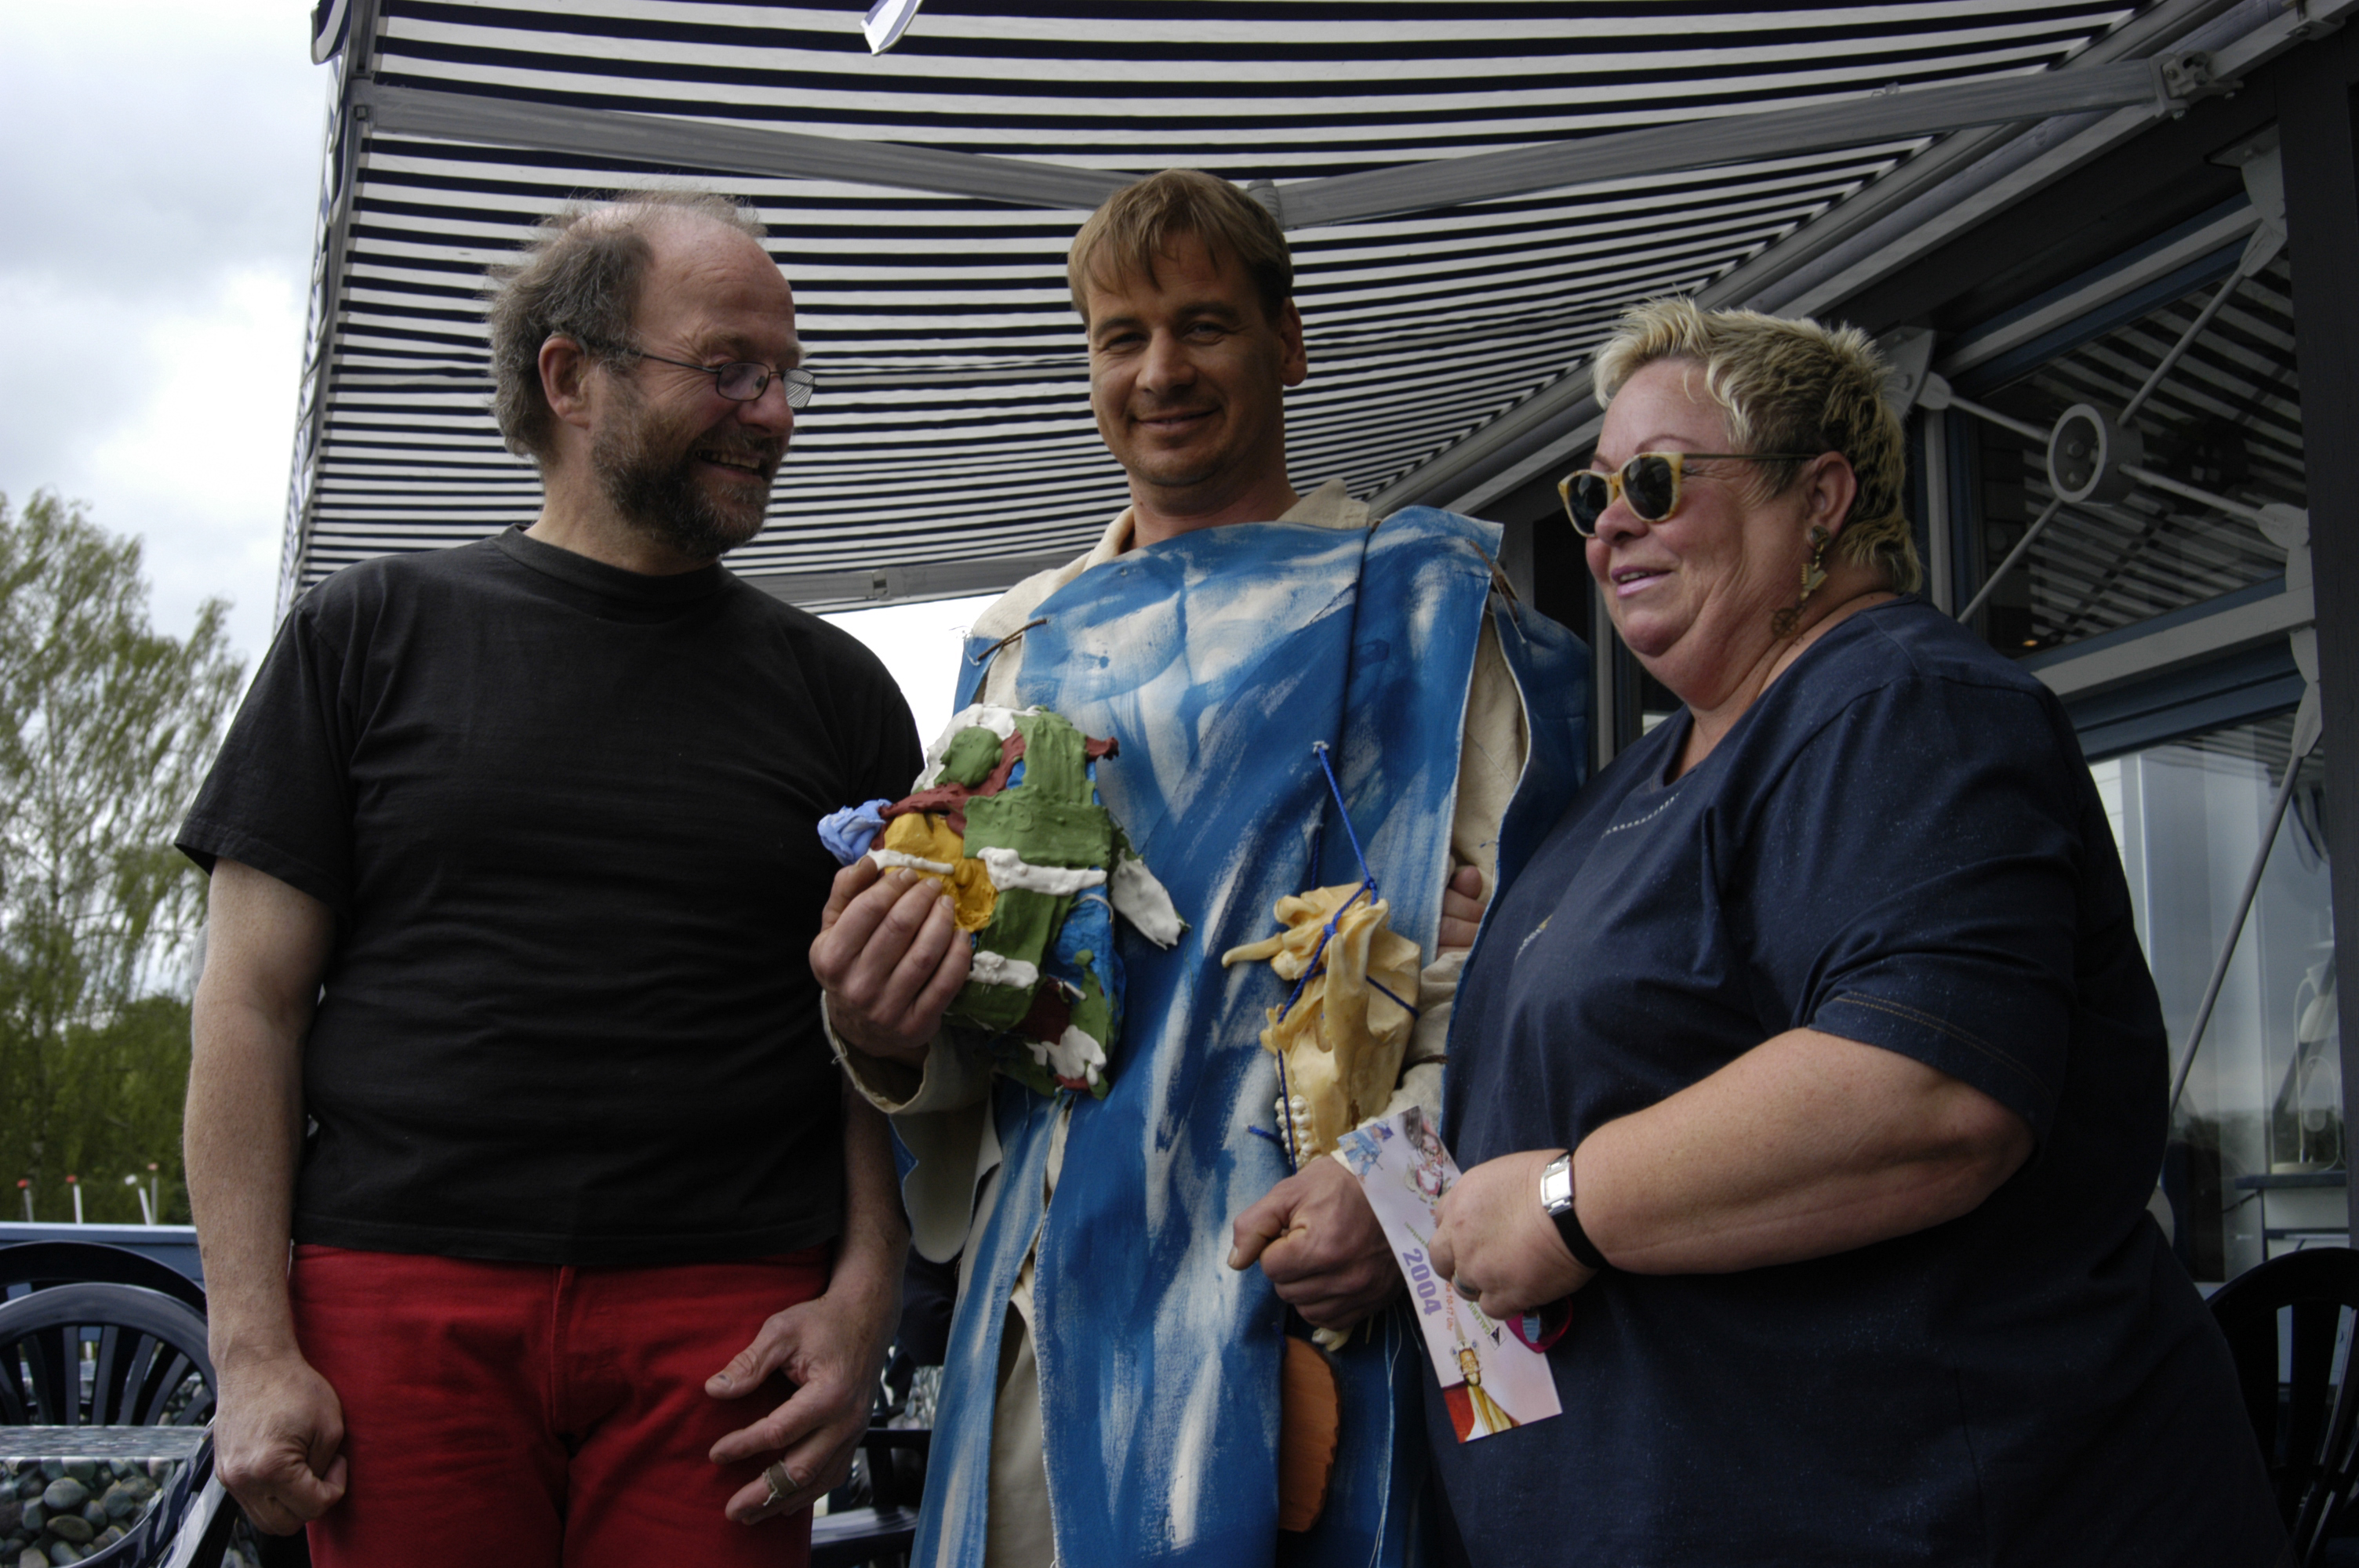 Manfred Forschner, Axel Theune, Frau Obermann